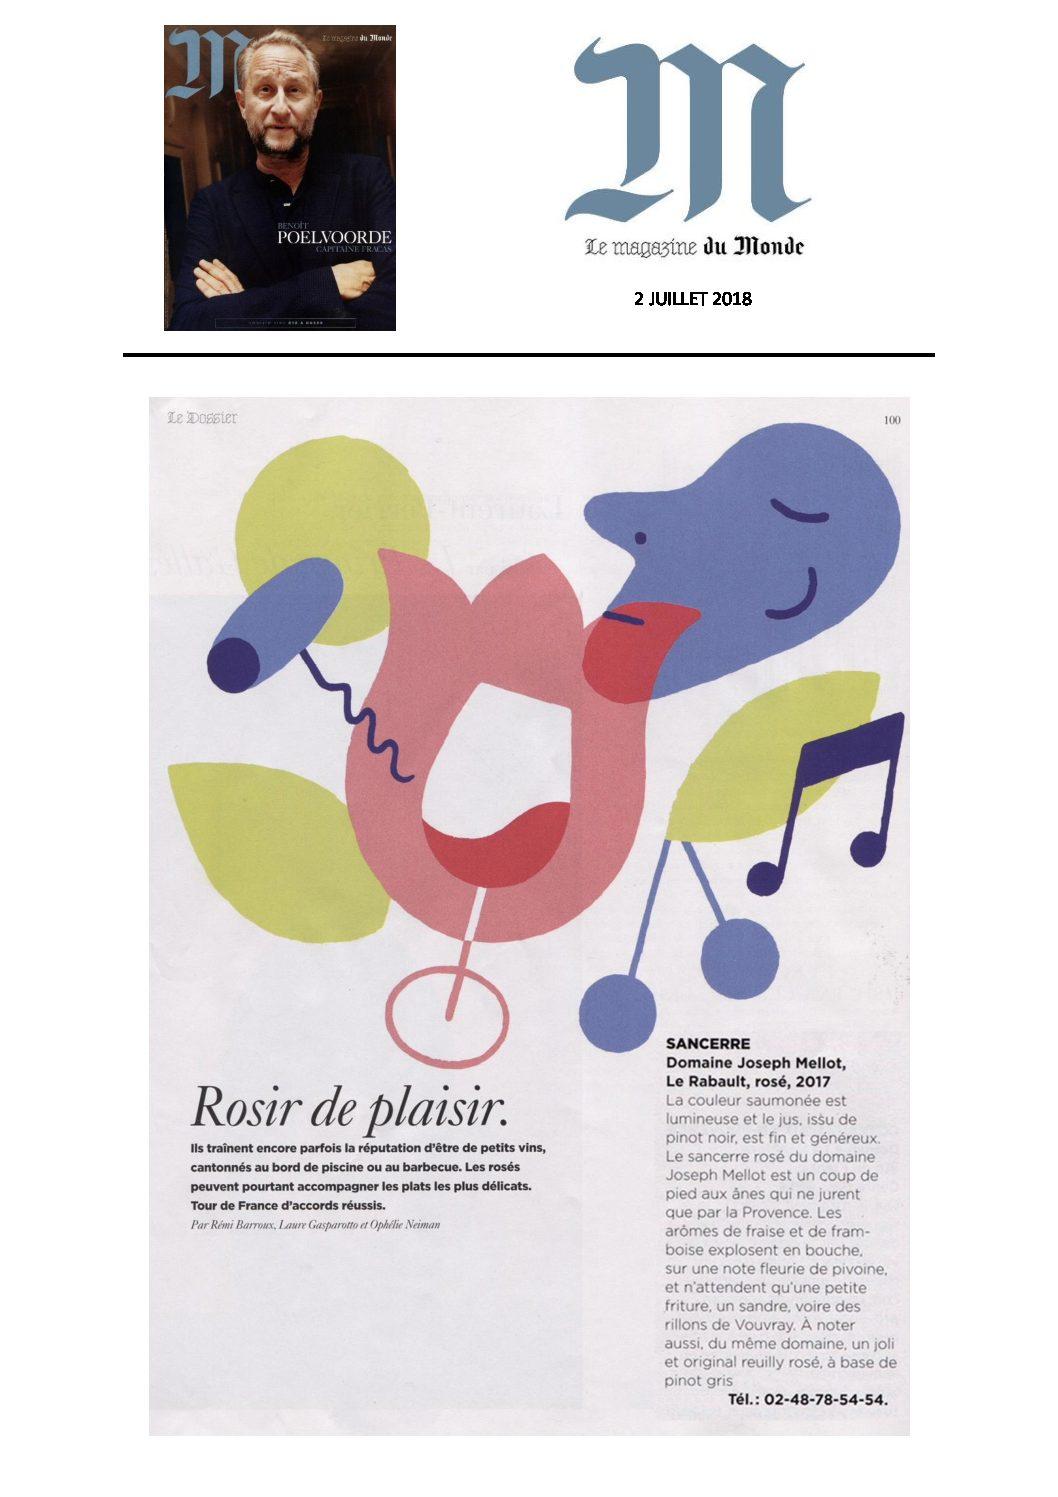 Joseph Mellot - Le Monde July 2018